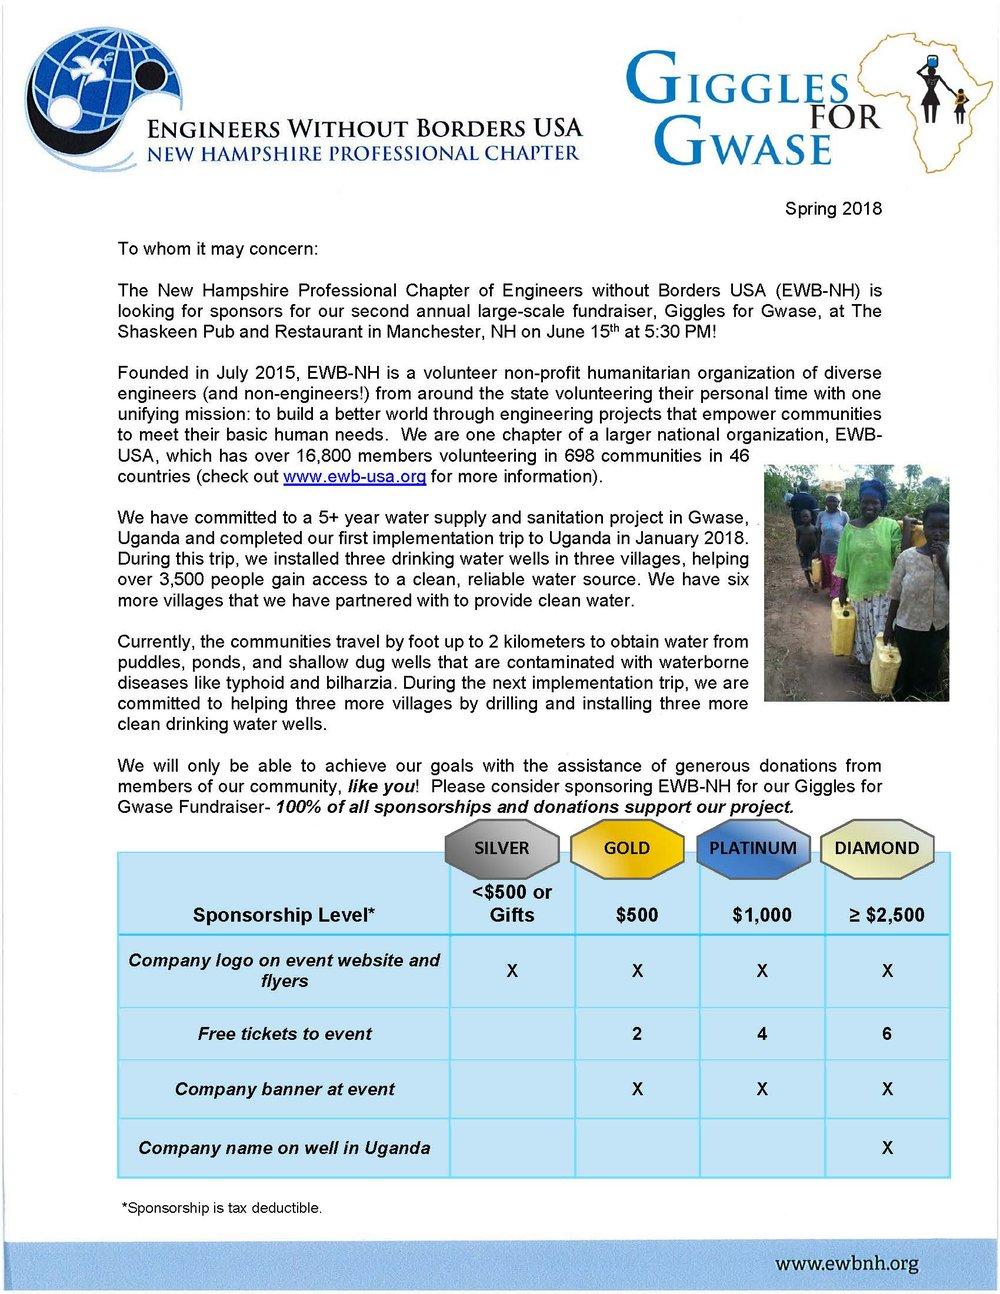 2018 EWBNH Water for Uganda Sponsorship Ltr_V2 (002)_Page_1.jpg